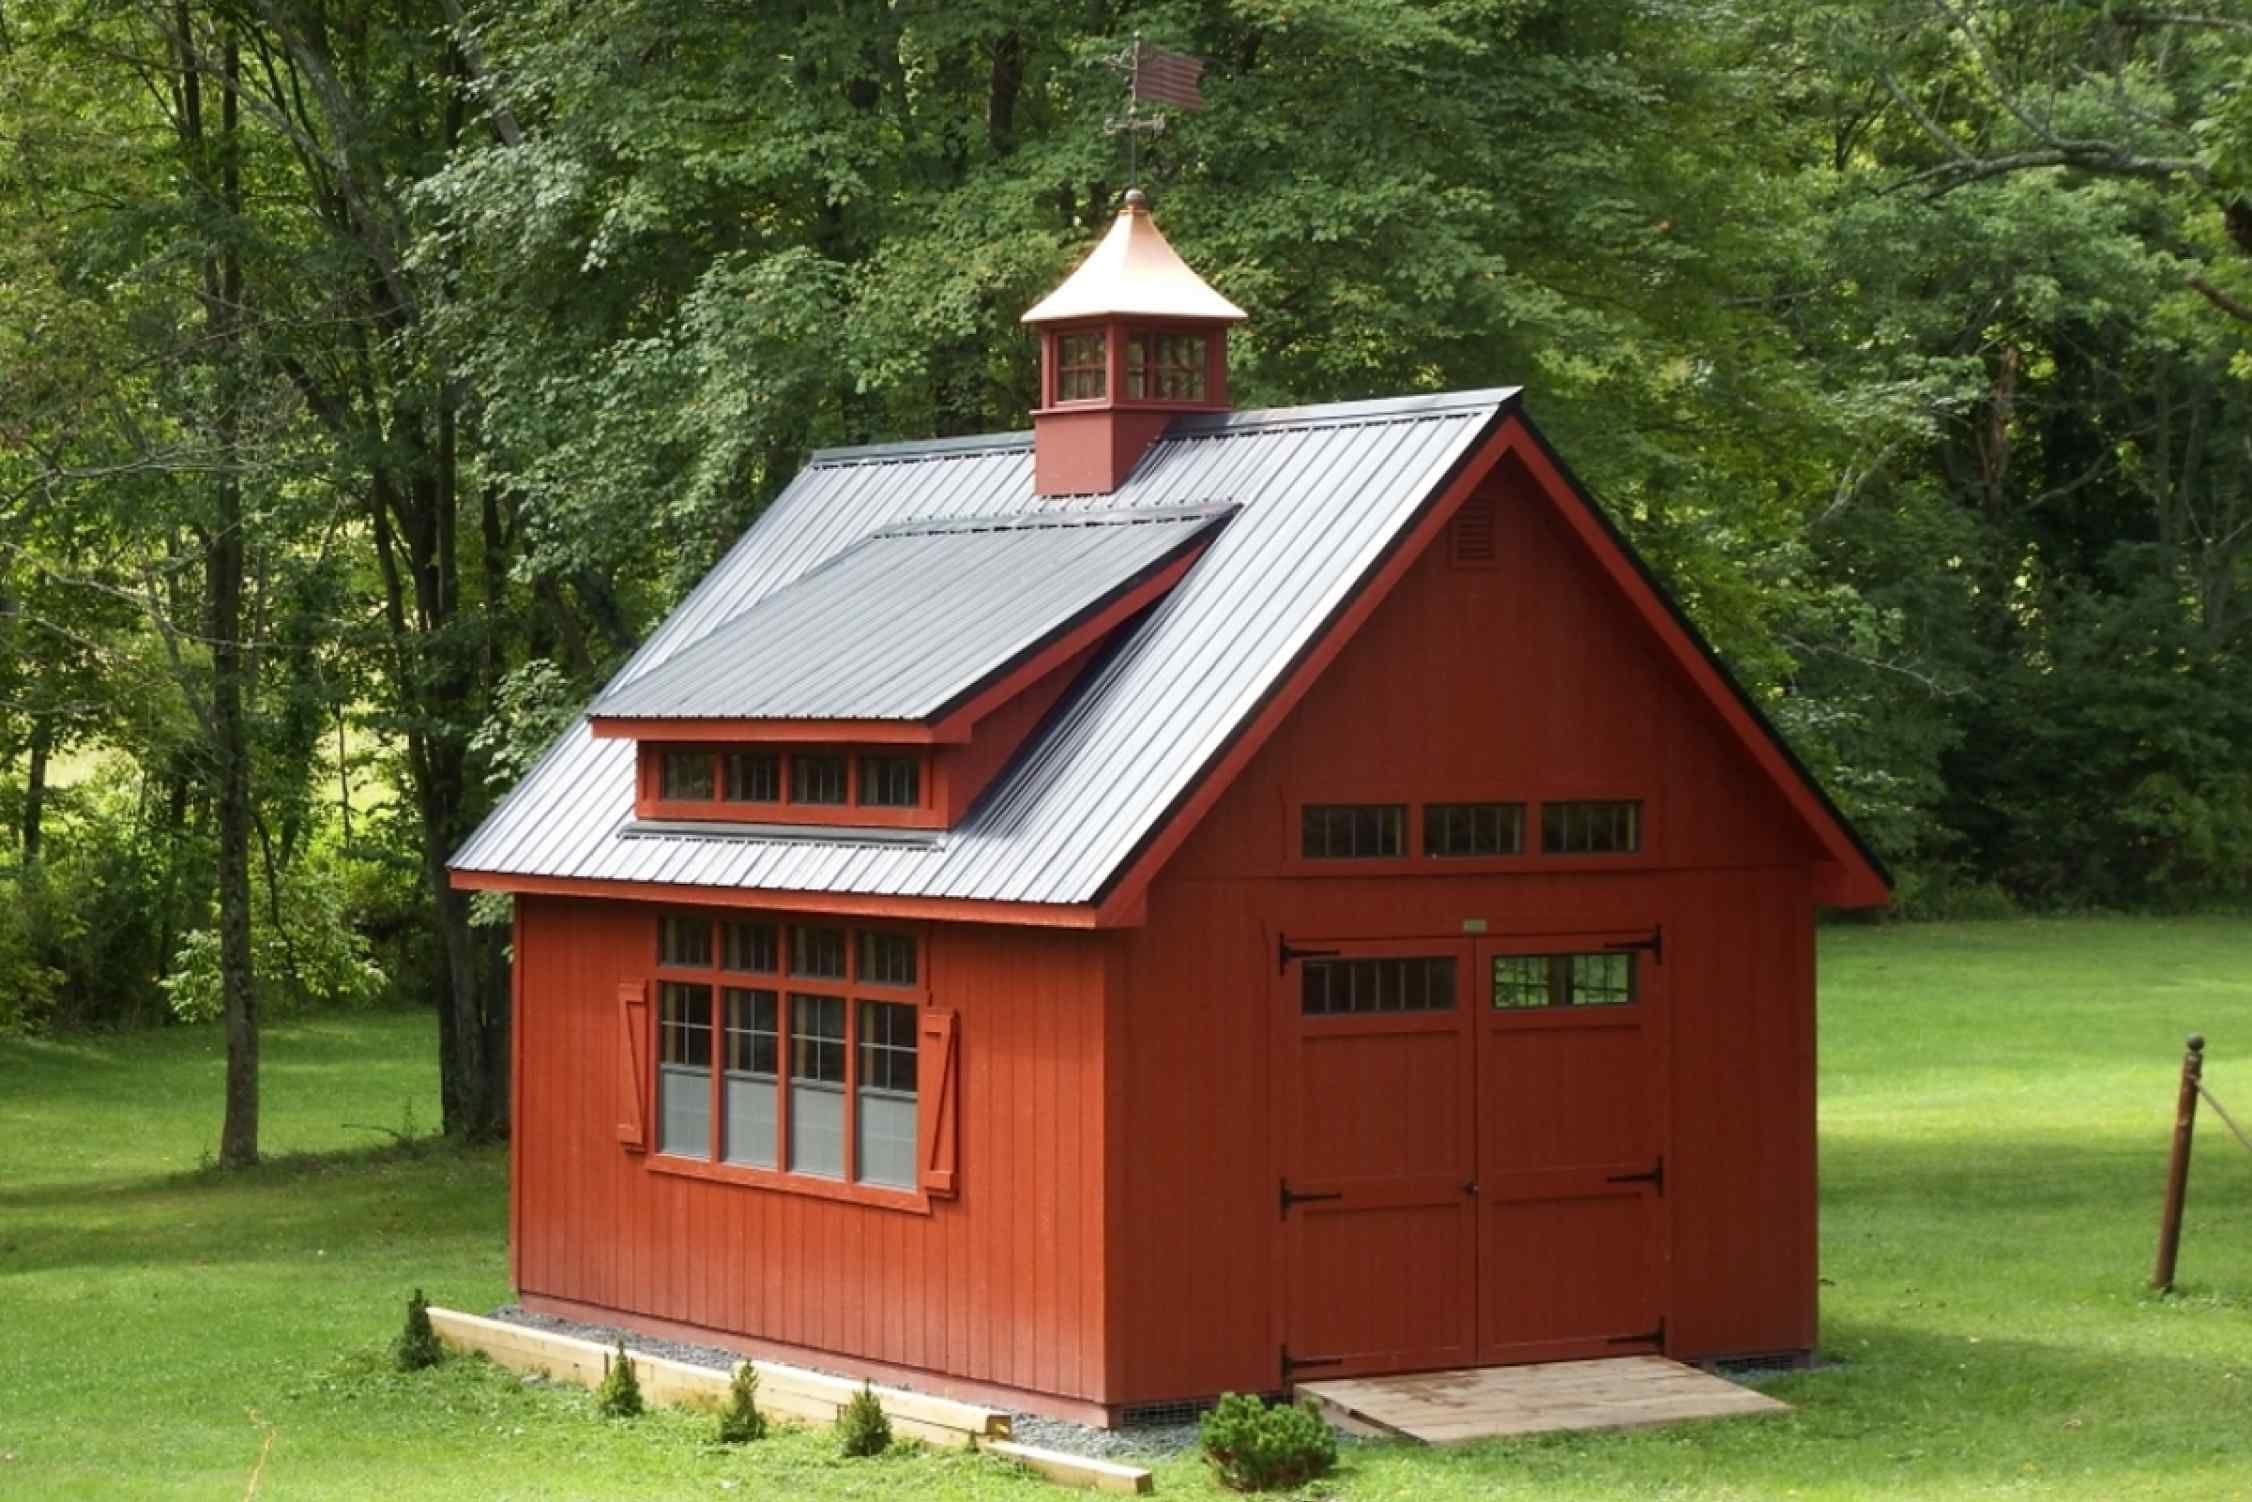 14x20 Colonial Barn Duratemp Siding Metal Roof 4 Transom Dormer 2 Additional Windows 7 Transom Windows Price As Farmhouse Garage Shed Homes Garage Design